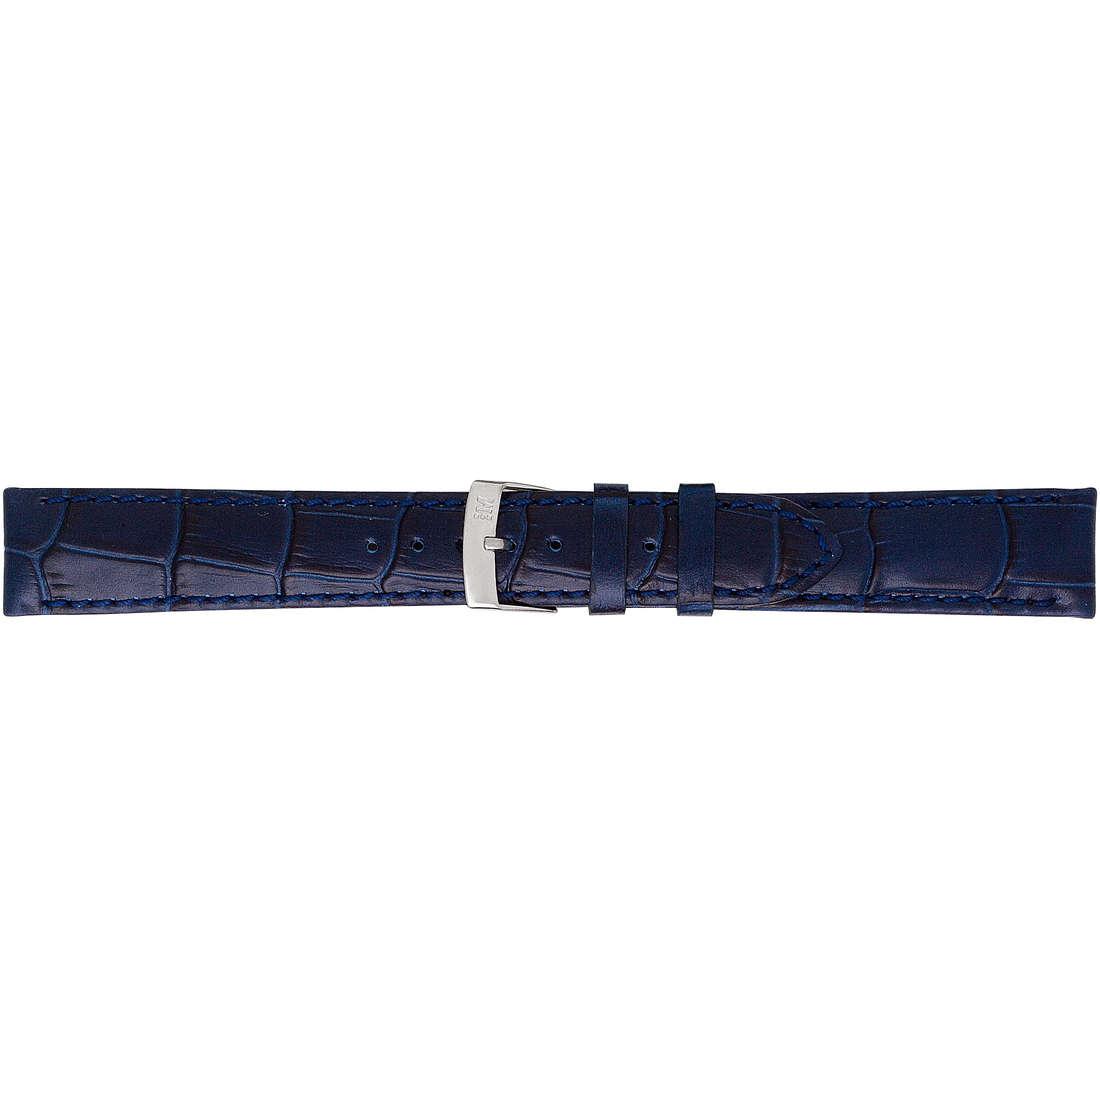 montre bande de montres homme Morellato Performance A01X2704656062CR16